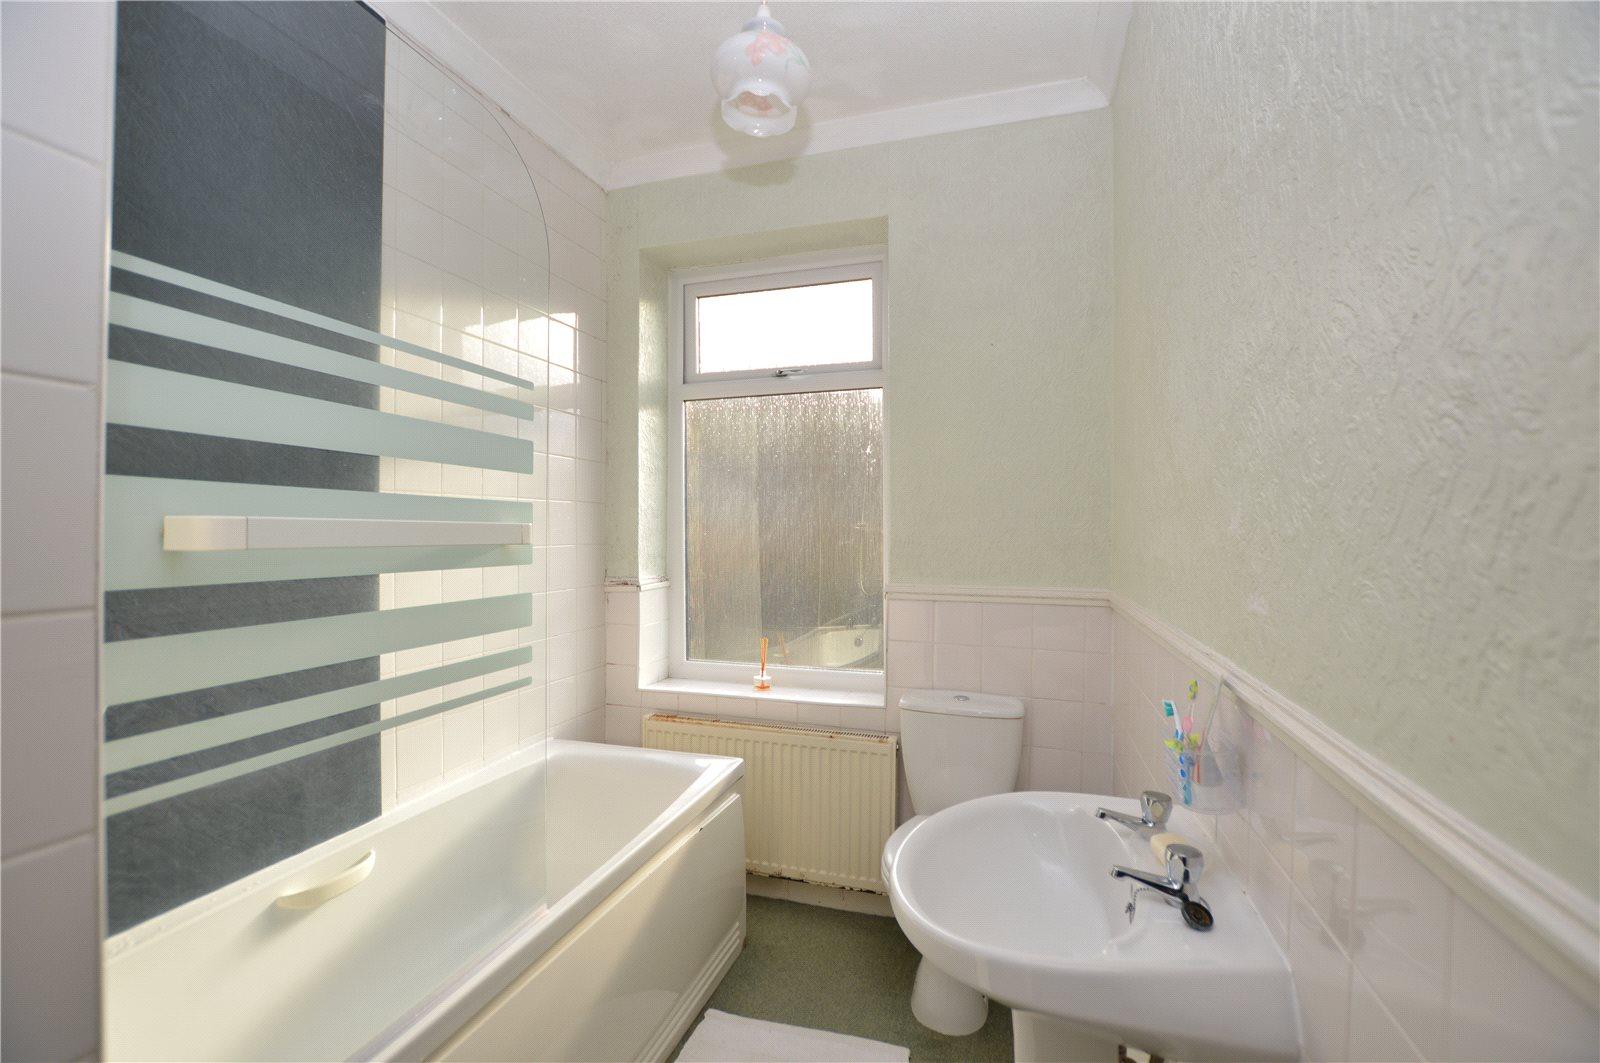 Property for sale in Batley, interior white bathroom suite